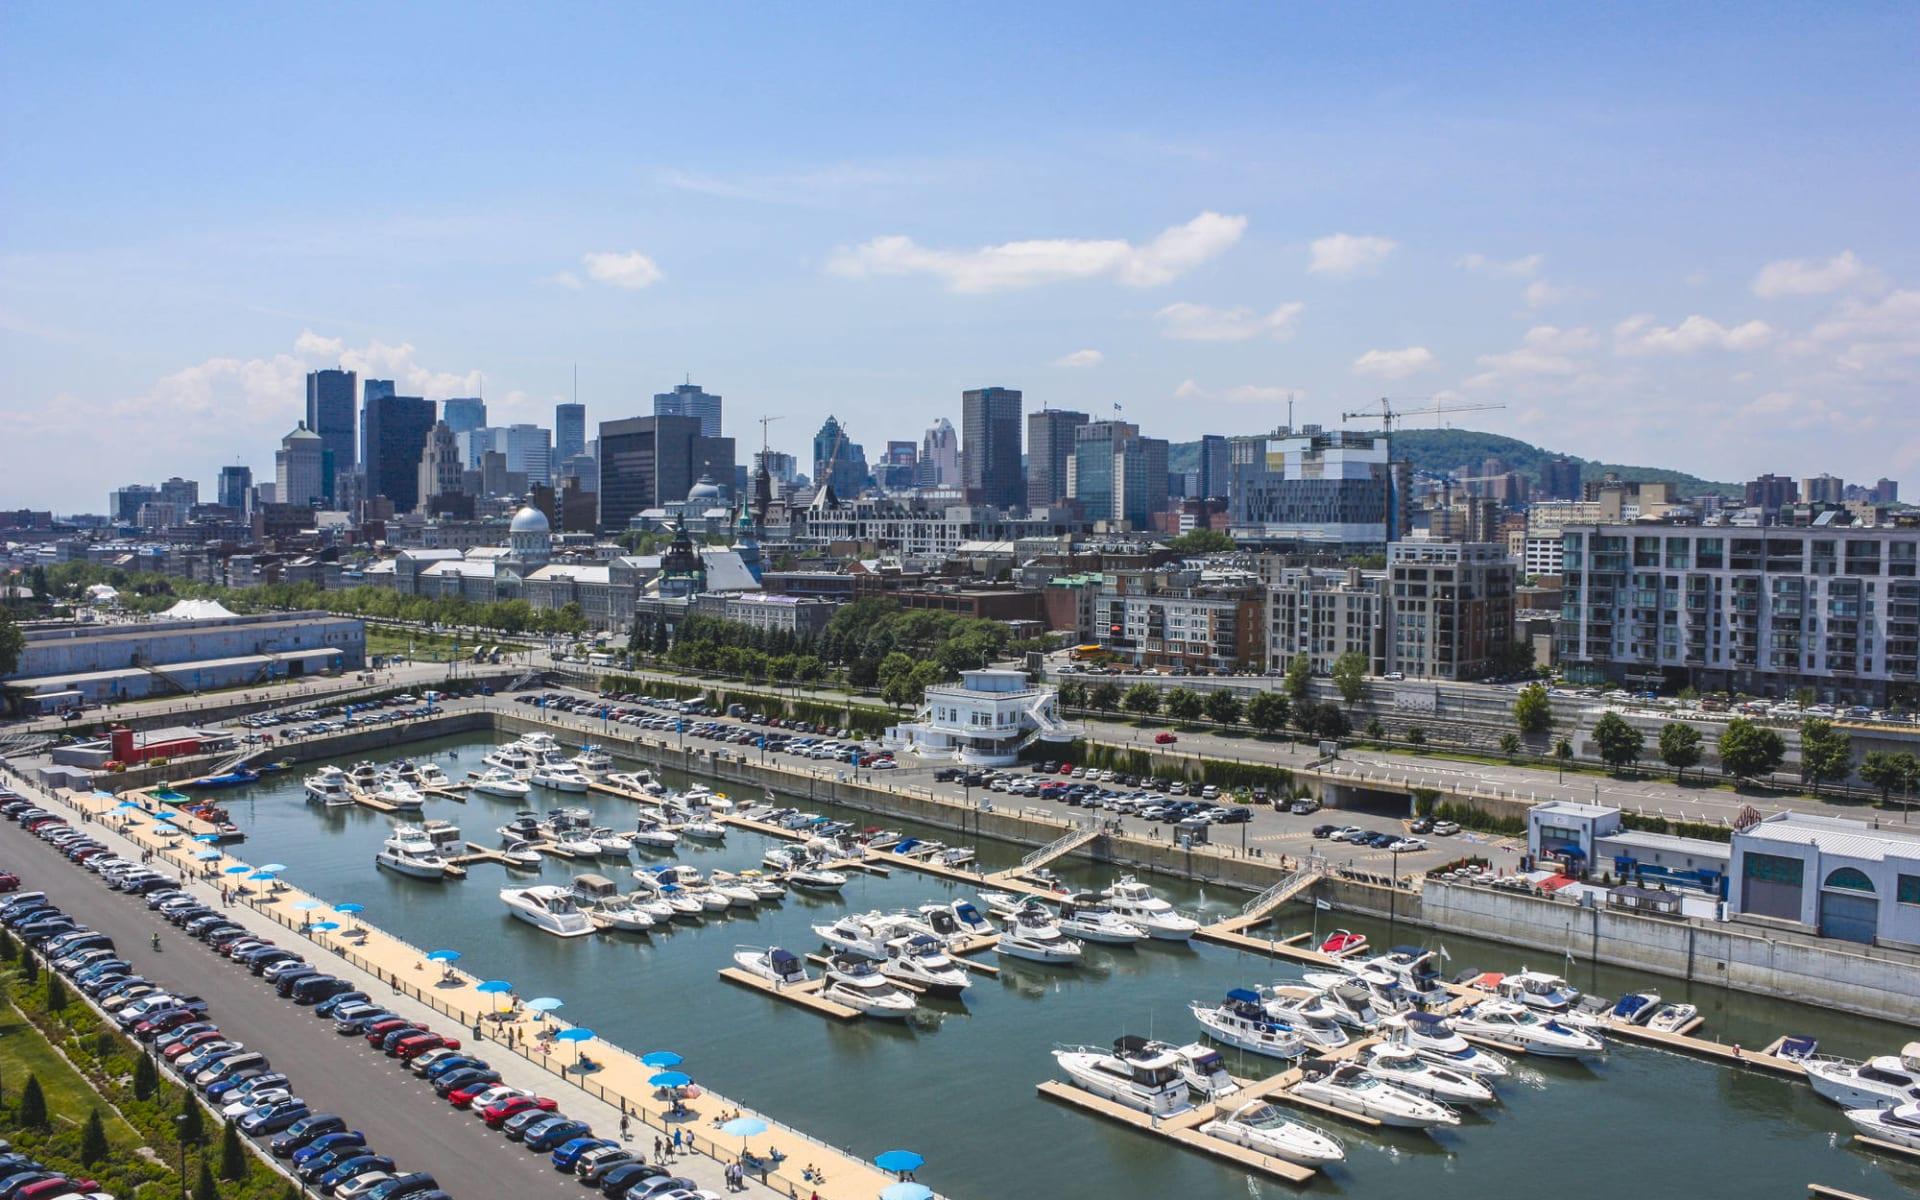 Höhepunkte Ostkanadas ab Toronto: Kanada - Montreal - Old Port Downtown